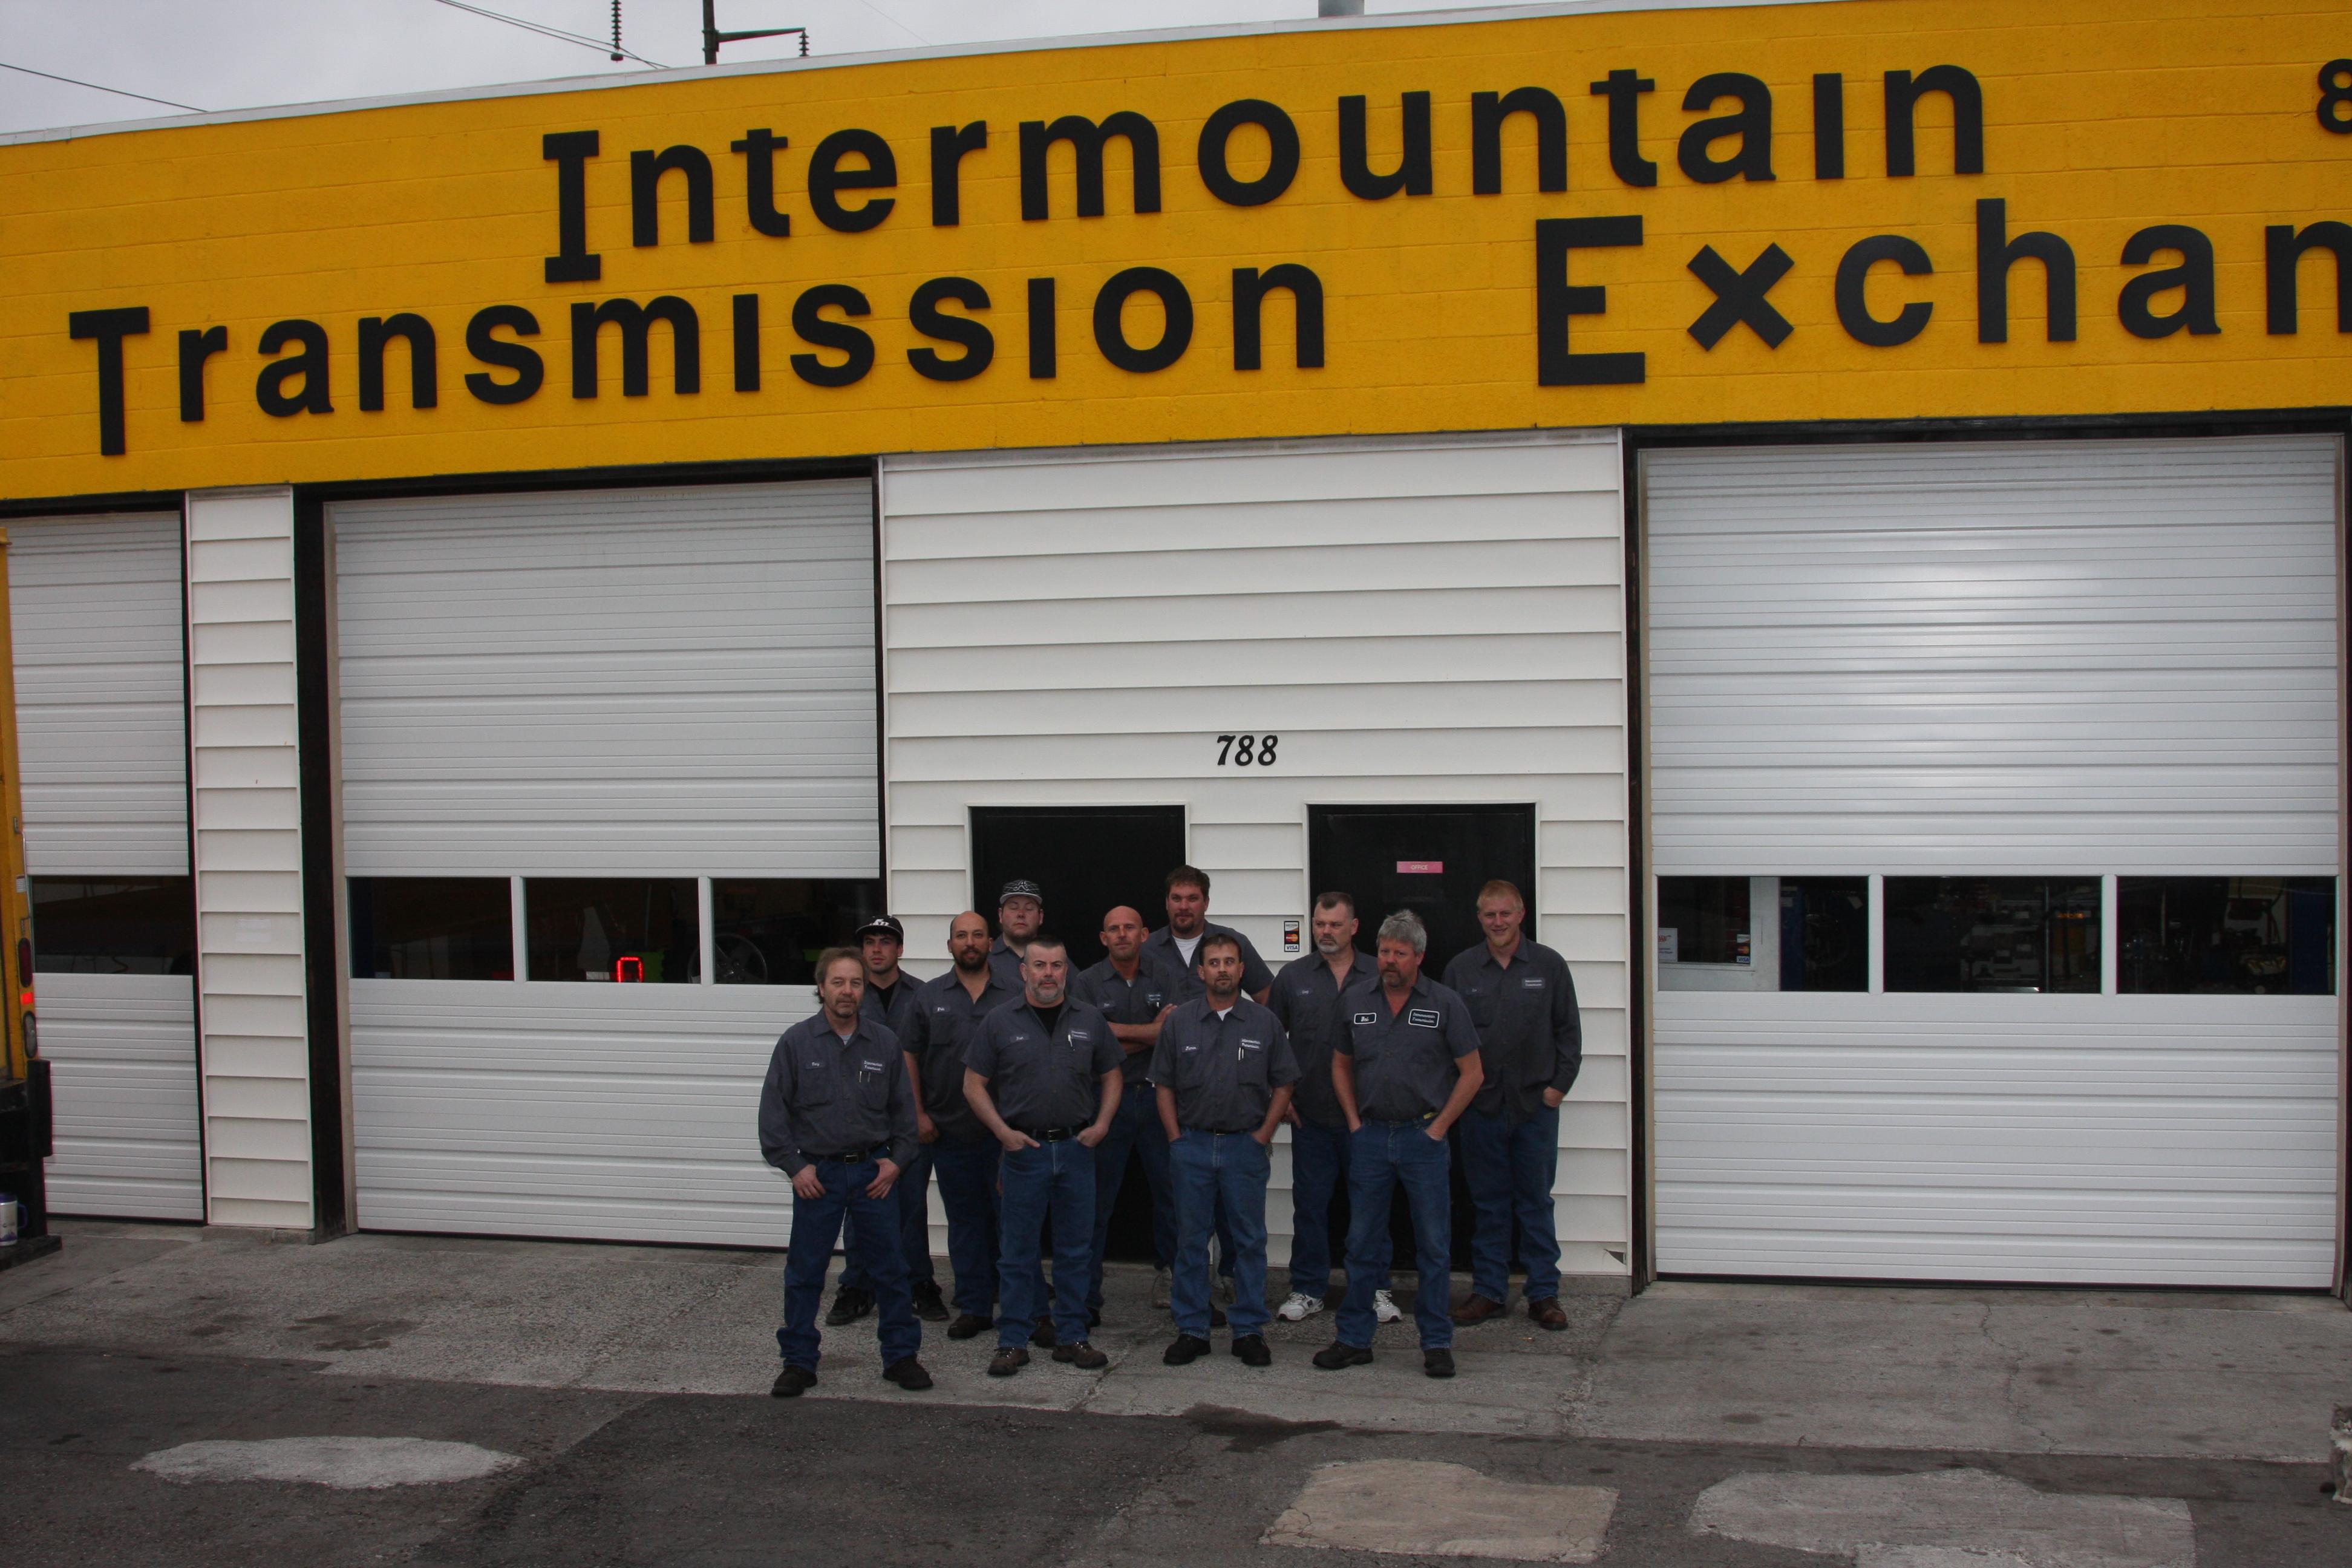 Intermountain Transmission Exchange Inc. - ad image